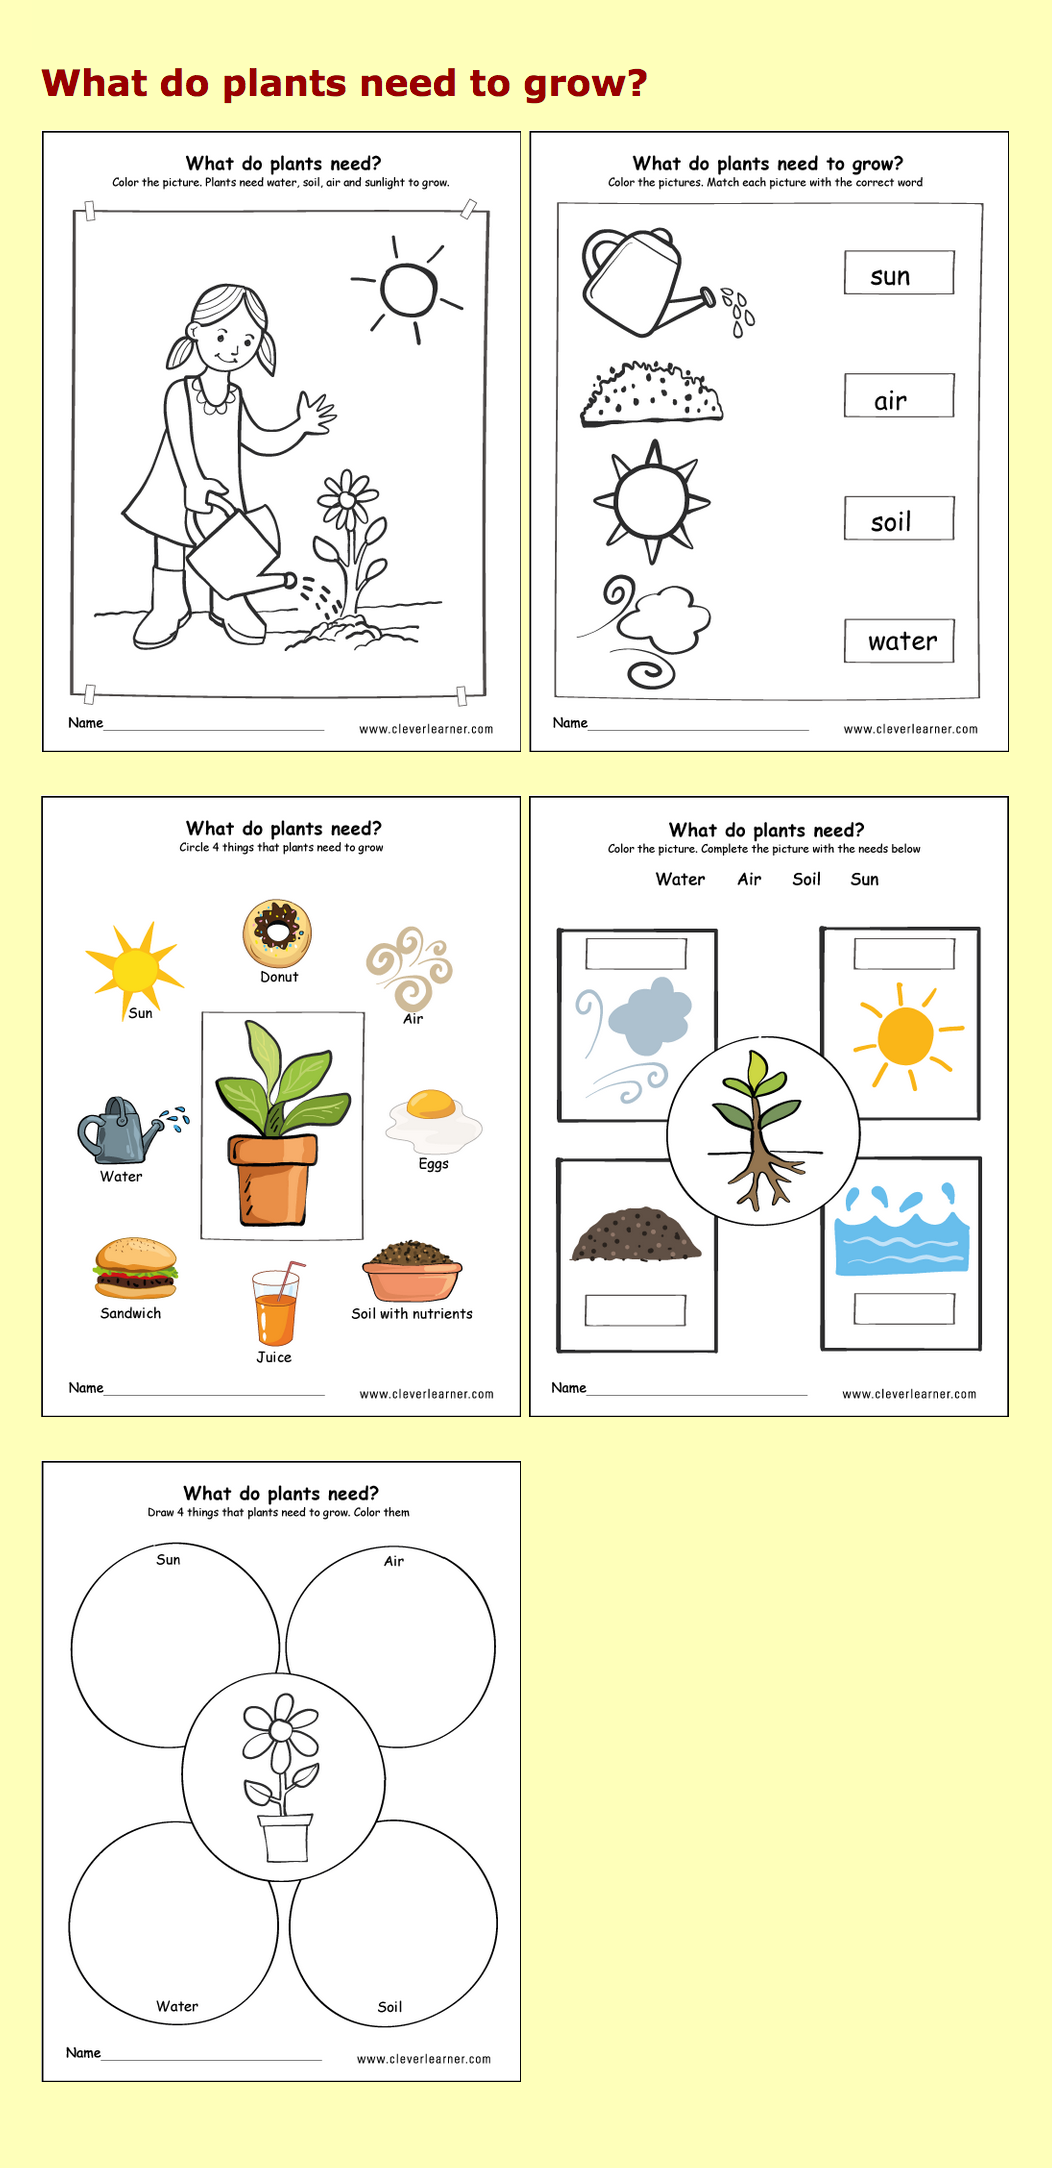 Worksheets Preschool Science Worksheets needs of plants kindergarten worksheets preschool parenting find this pin and more on science activity worksheet by joshquaye